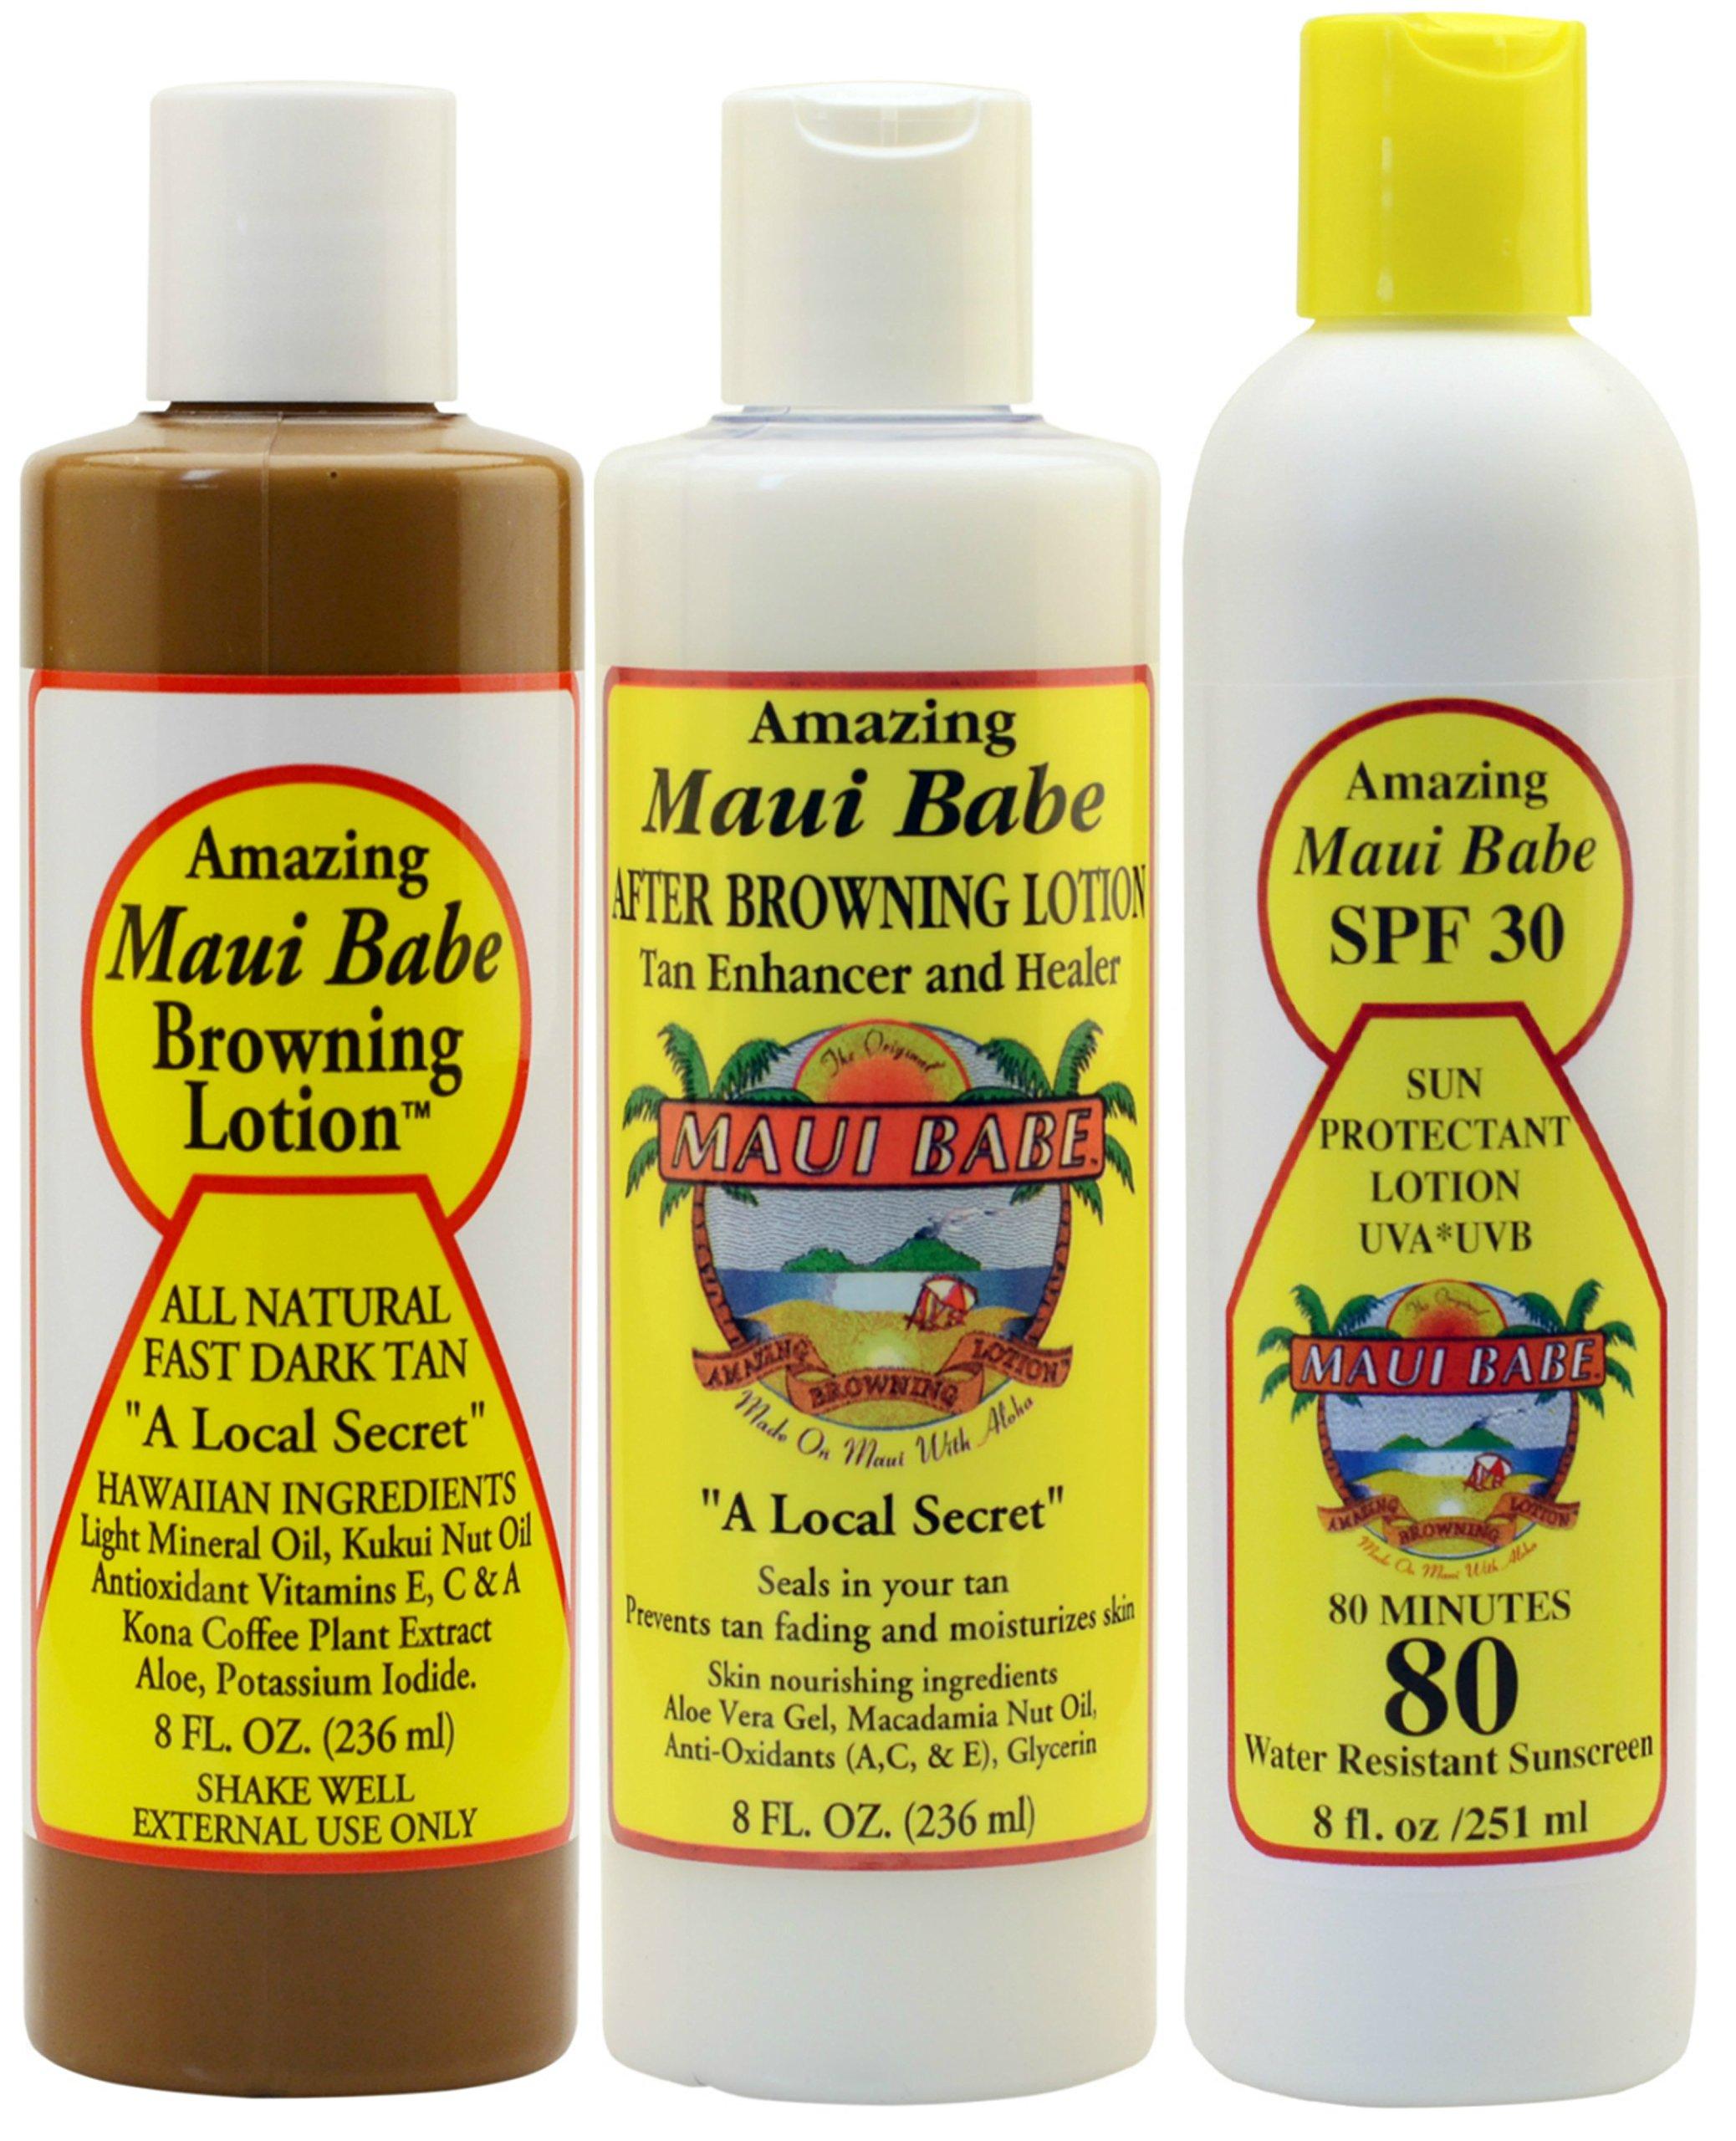 Maui Babe Variety Beach Pack (Browning Lotion 8 oz, After Browning Lotion 8 oz, and SPF 30 Sunblock 8 oz) by Maui Babe